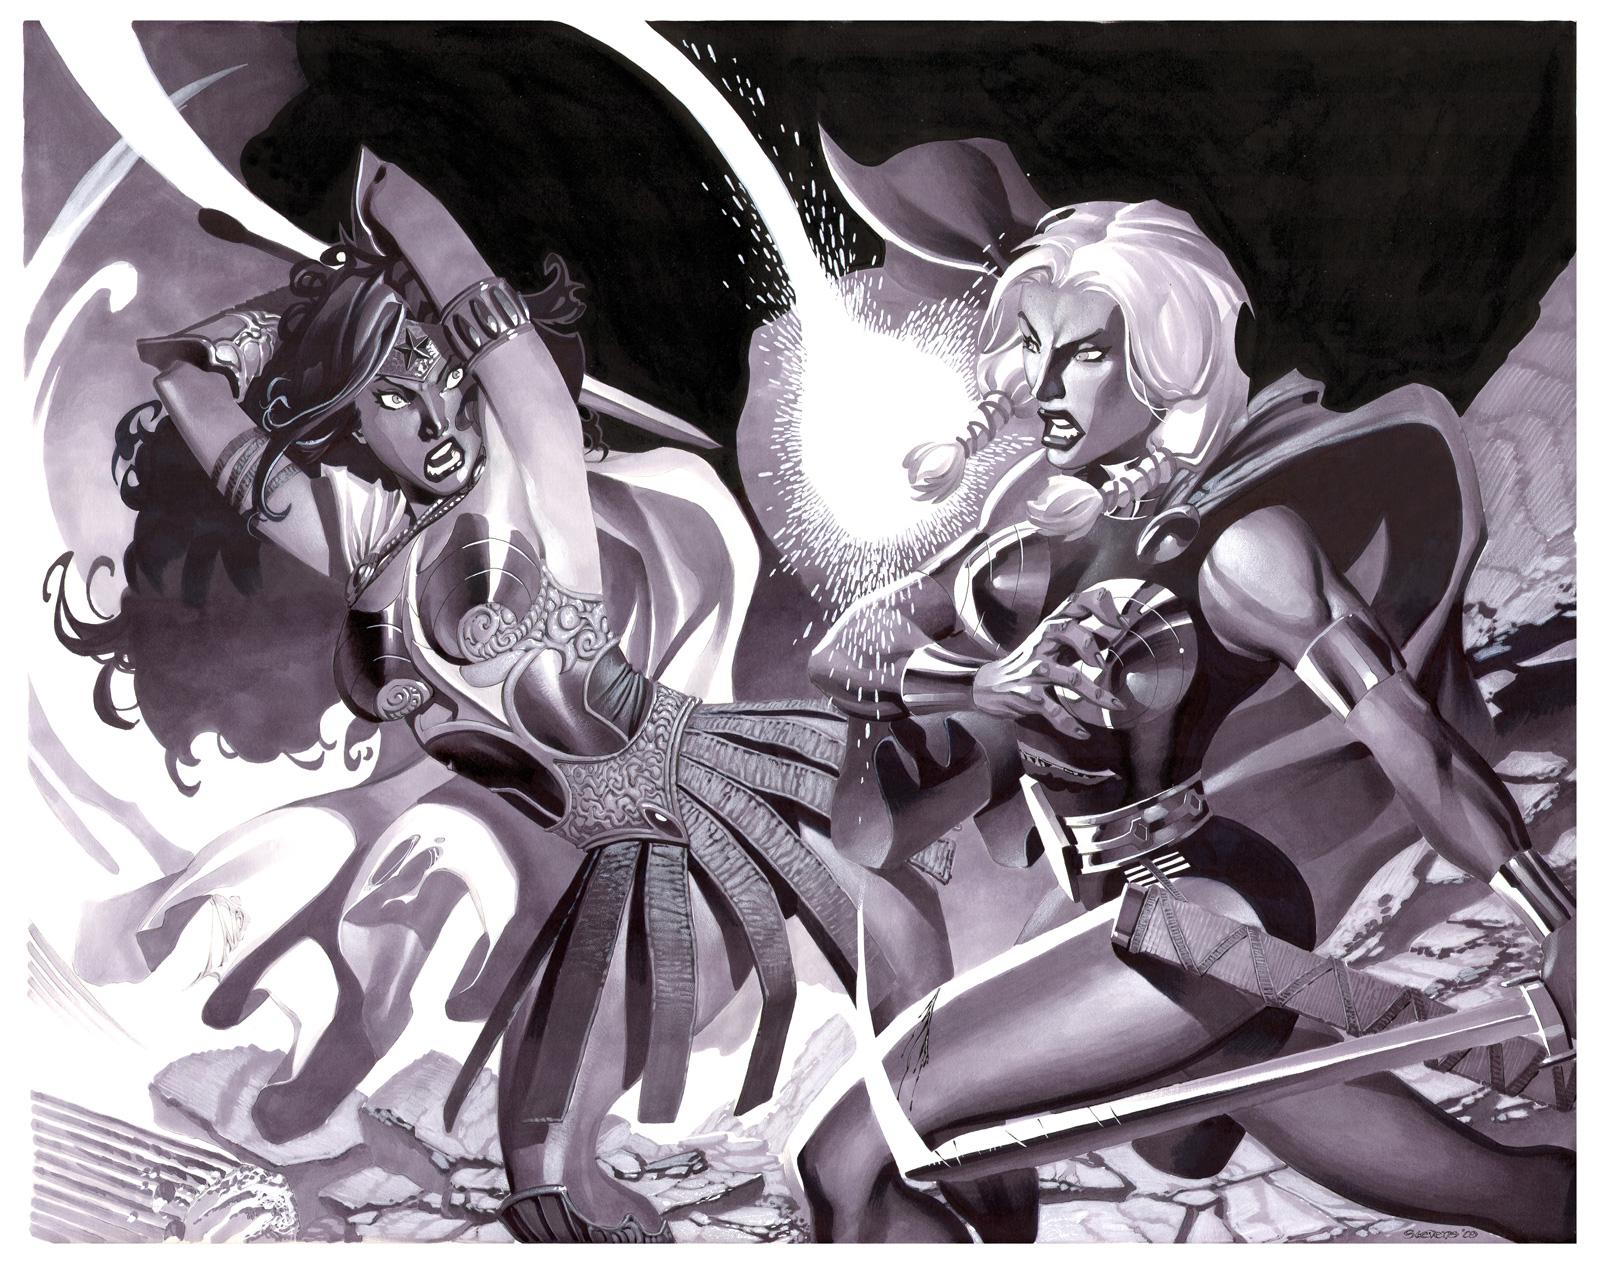 Wonder Woman VS Valkyrie